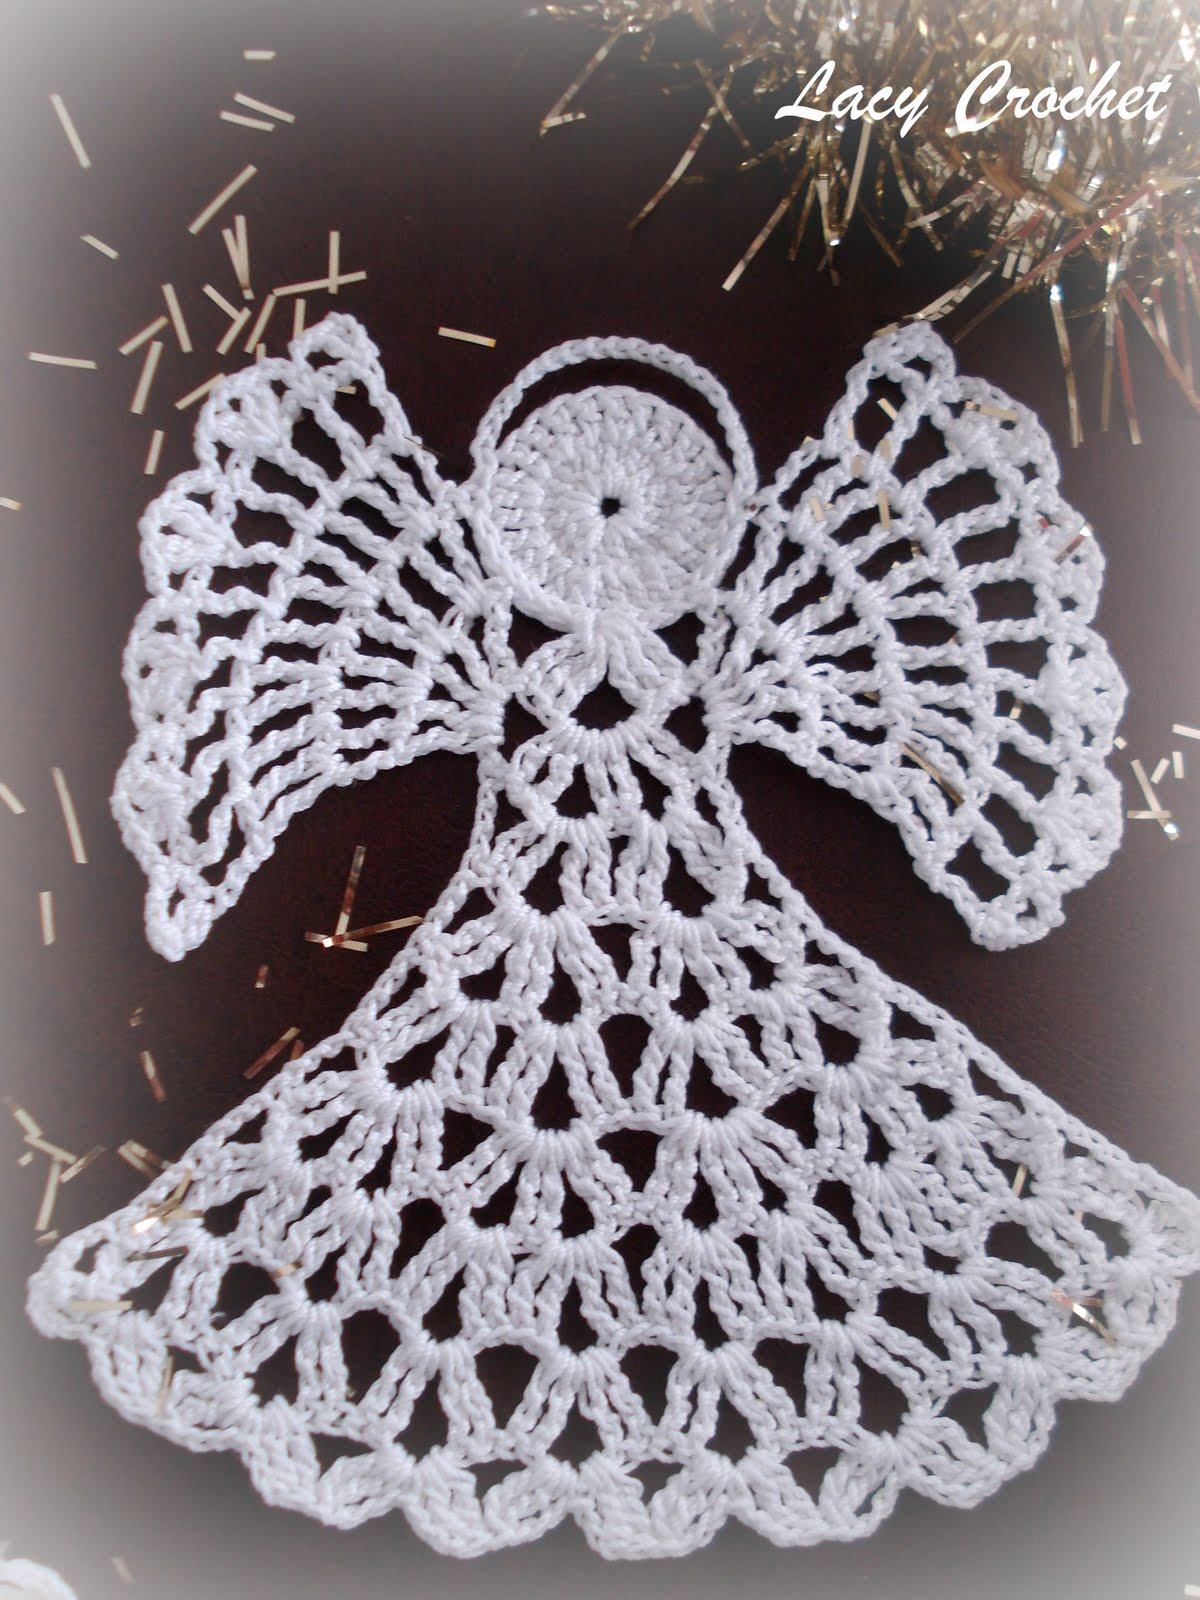 Lacy Crochet Crochet Angels